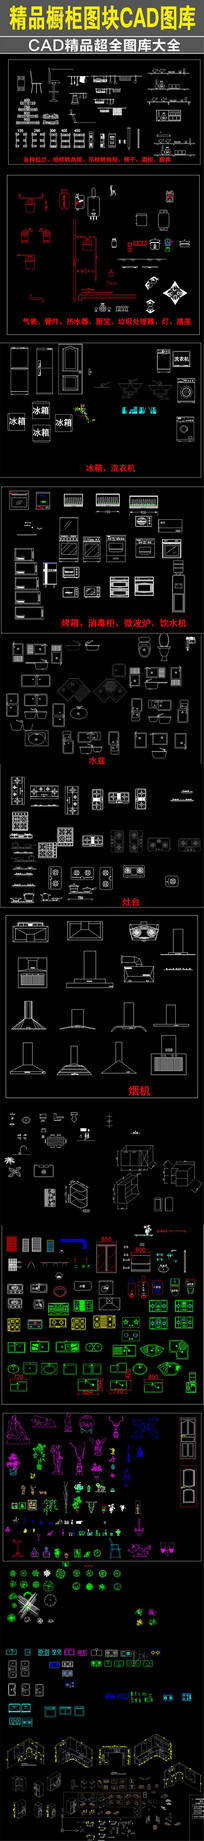 精品橱柜图块CAD图库